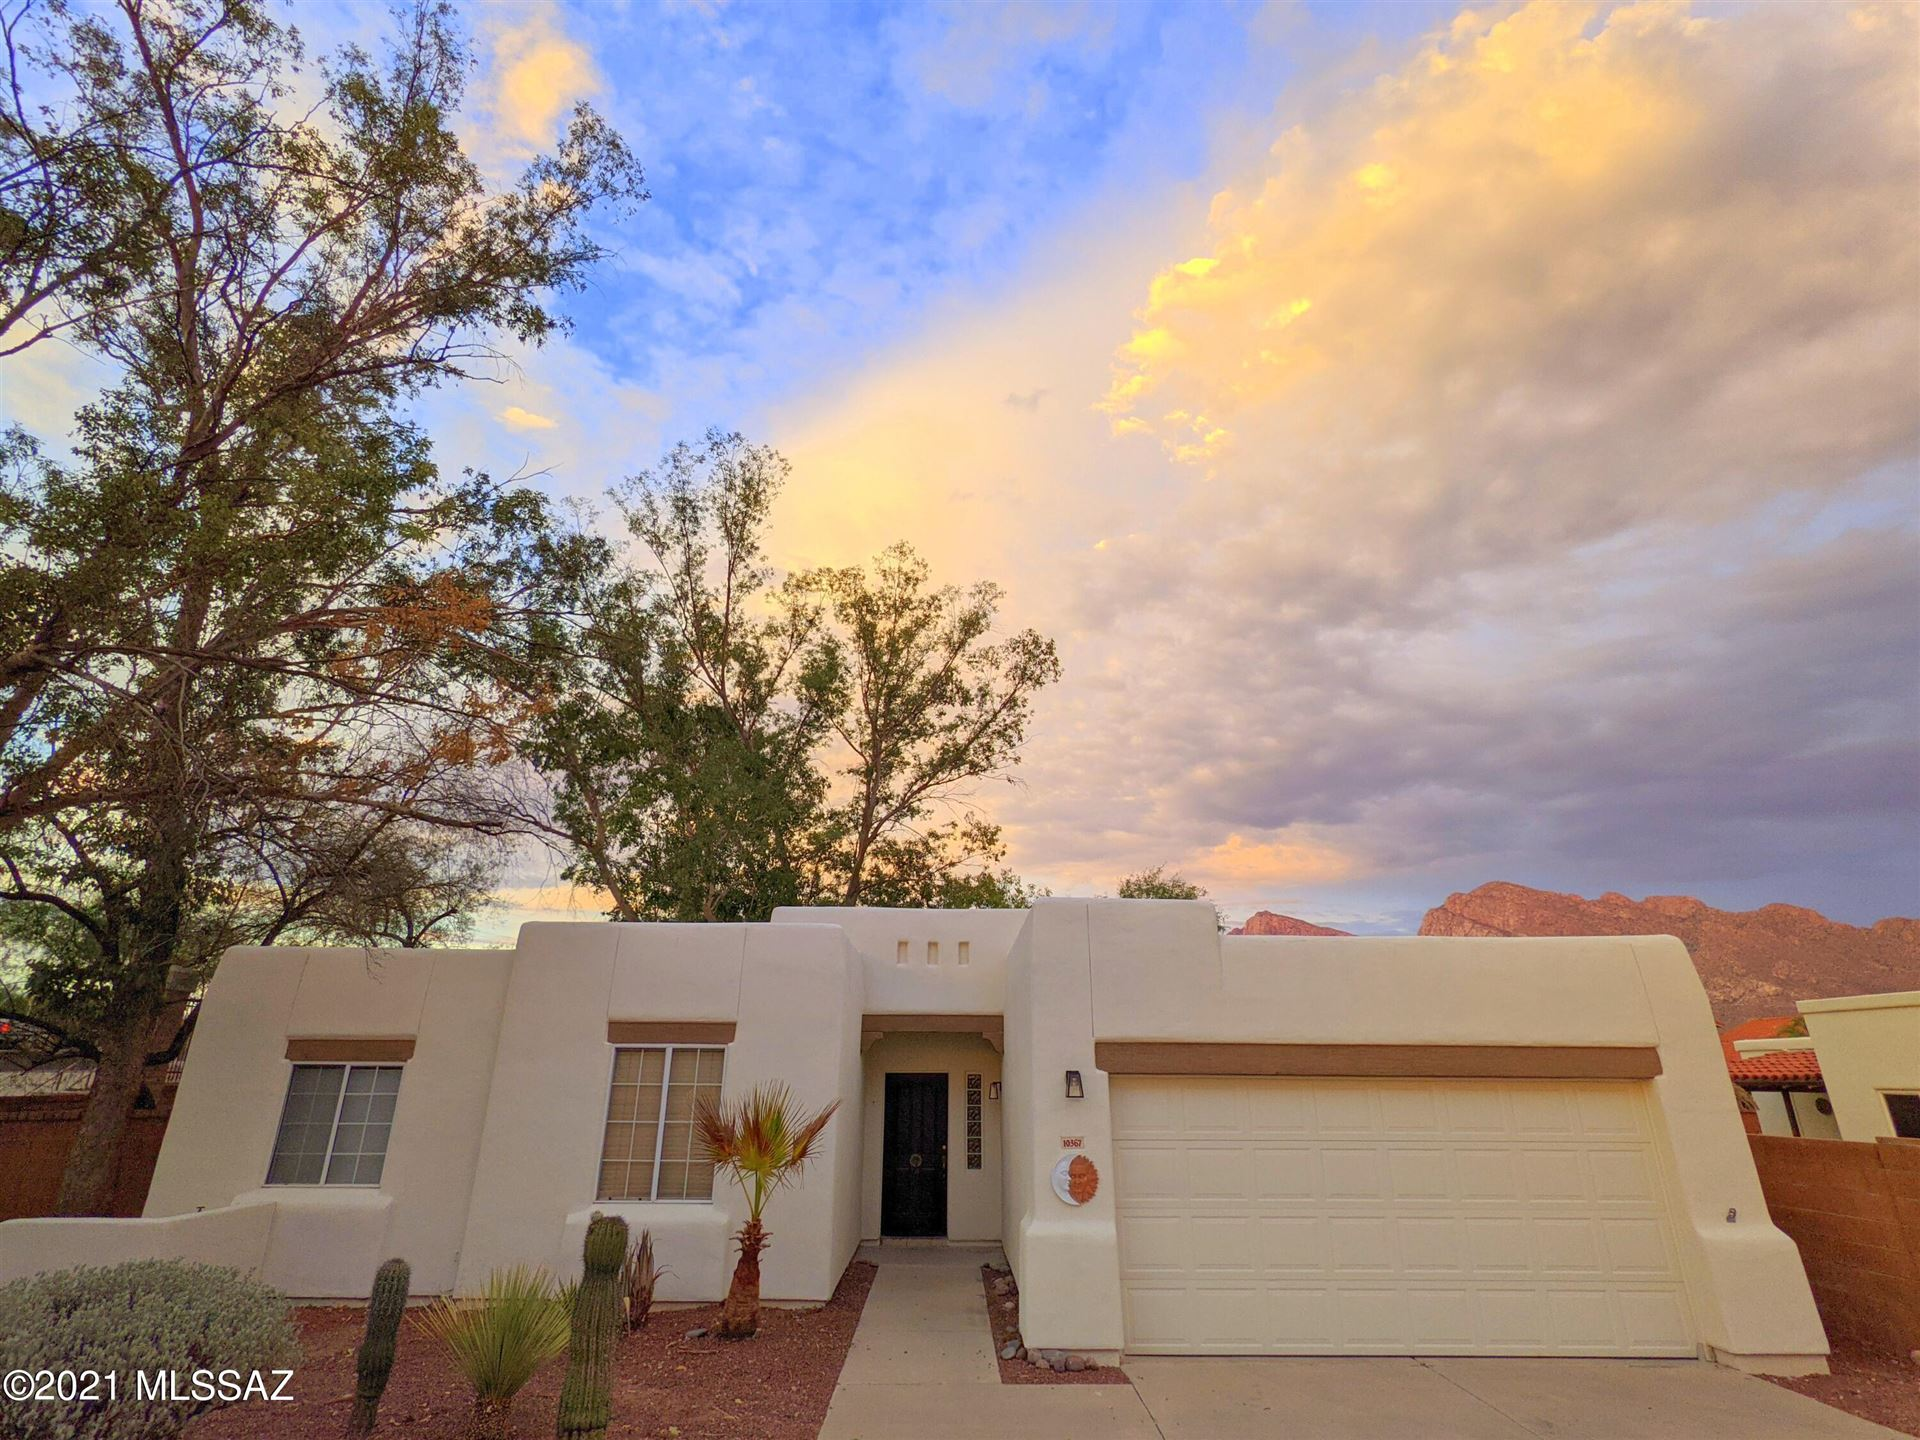 10367 N Fox Croft Lane, Tucson, AZ 85737 - MLS#: 22117402